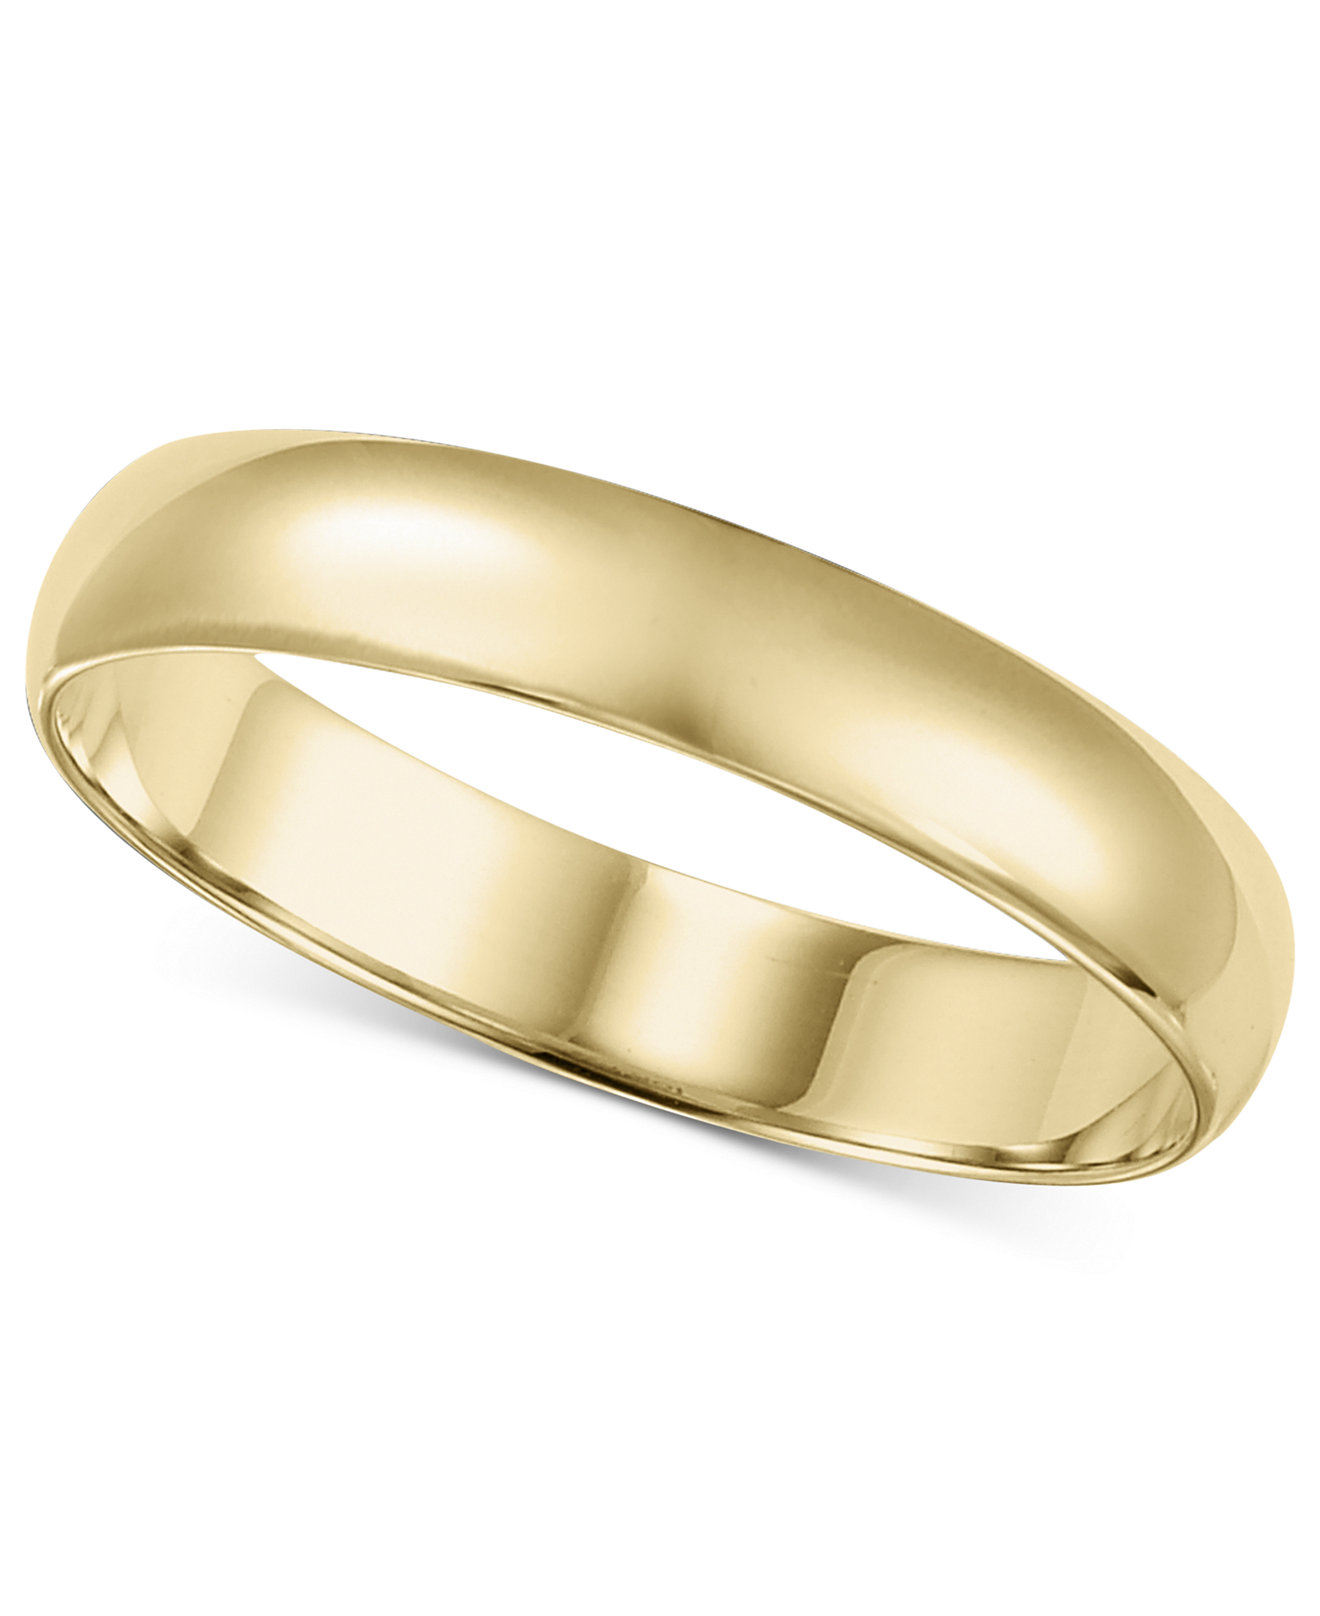 14k Gold 26mm Wedding Band